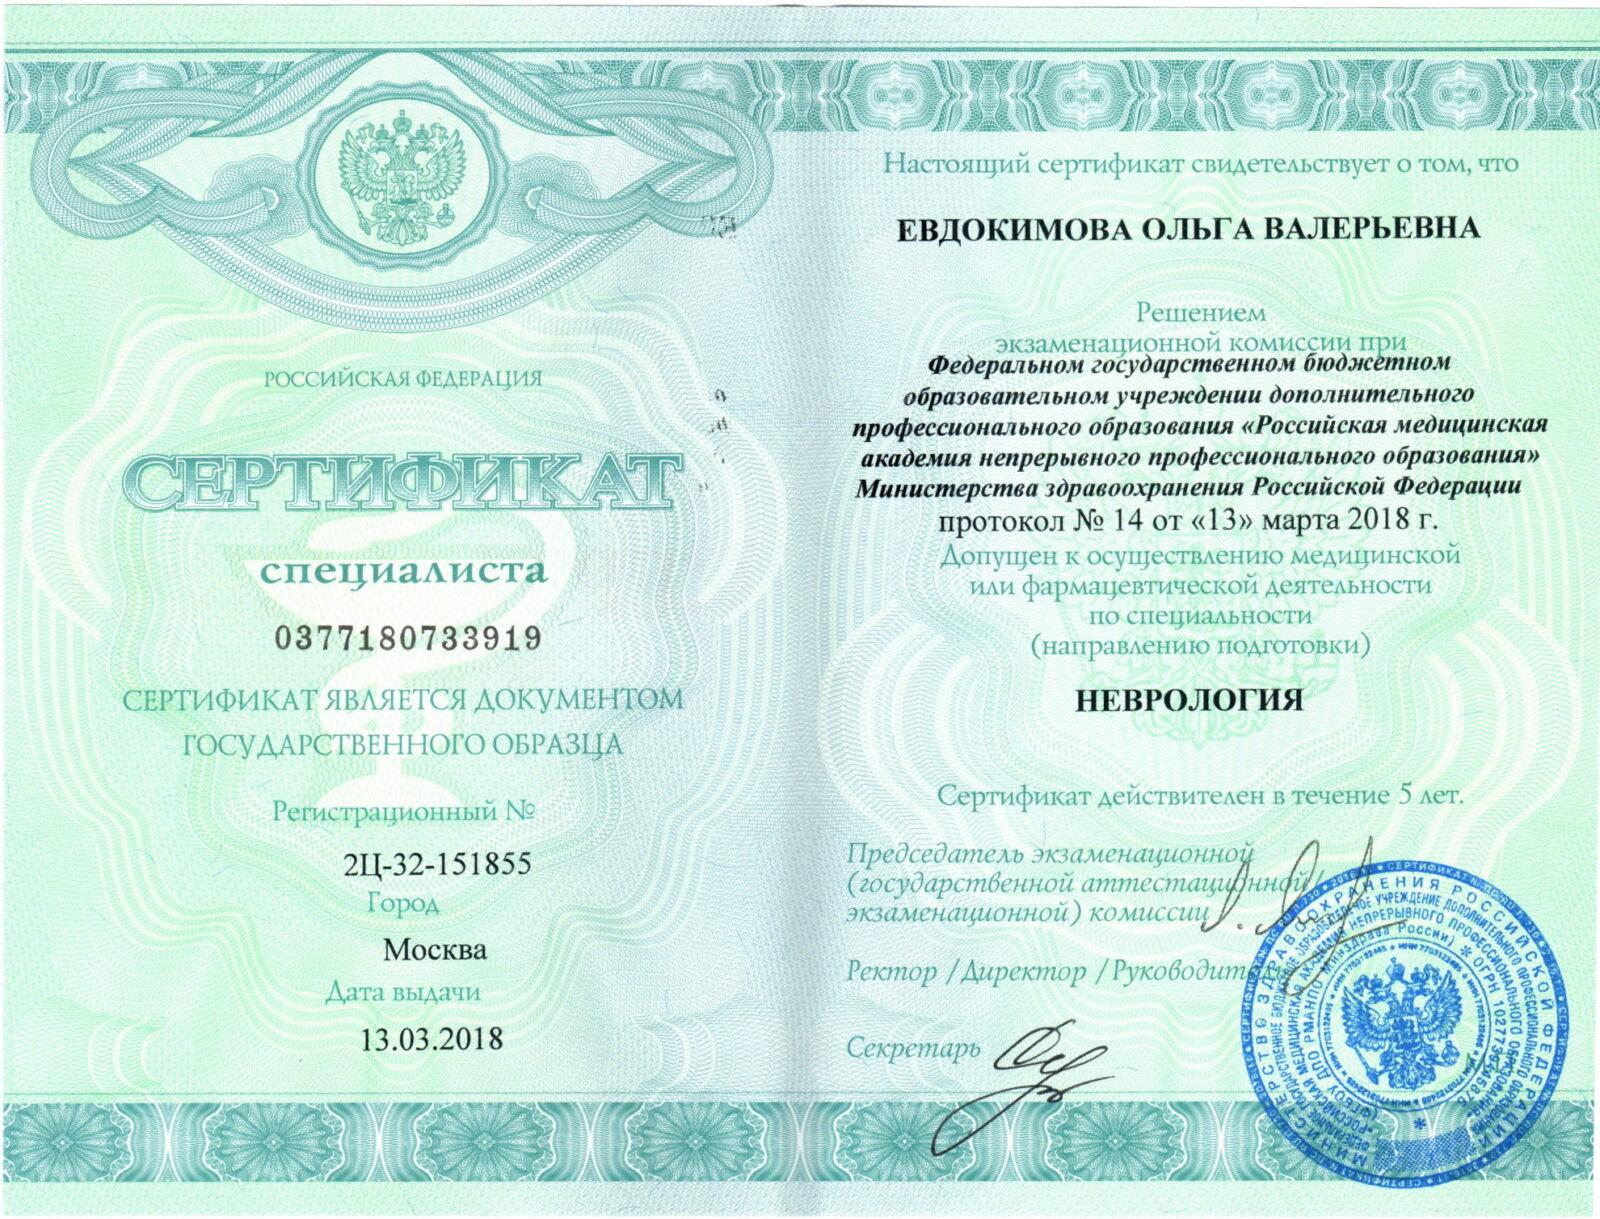 2018.03.13 Сертификат